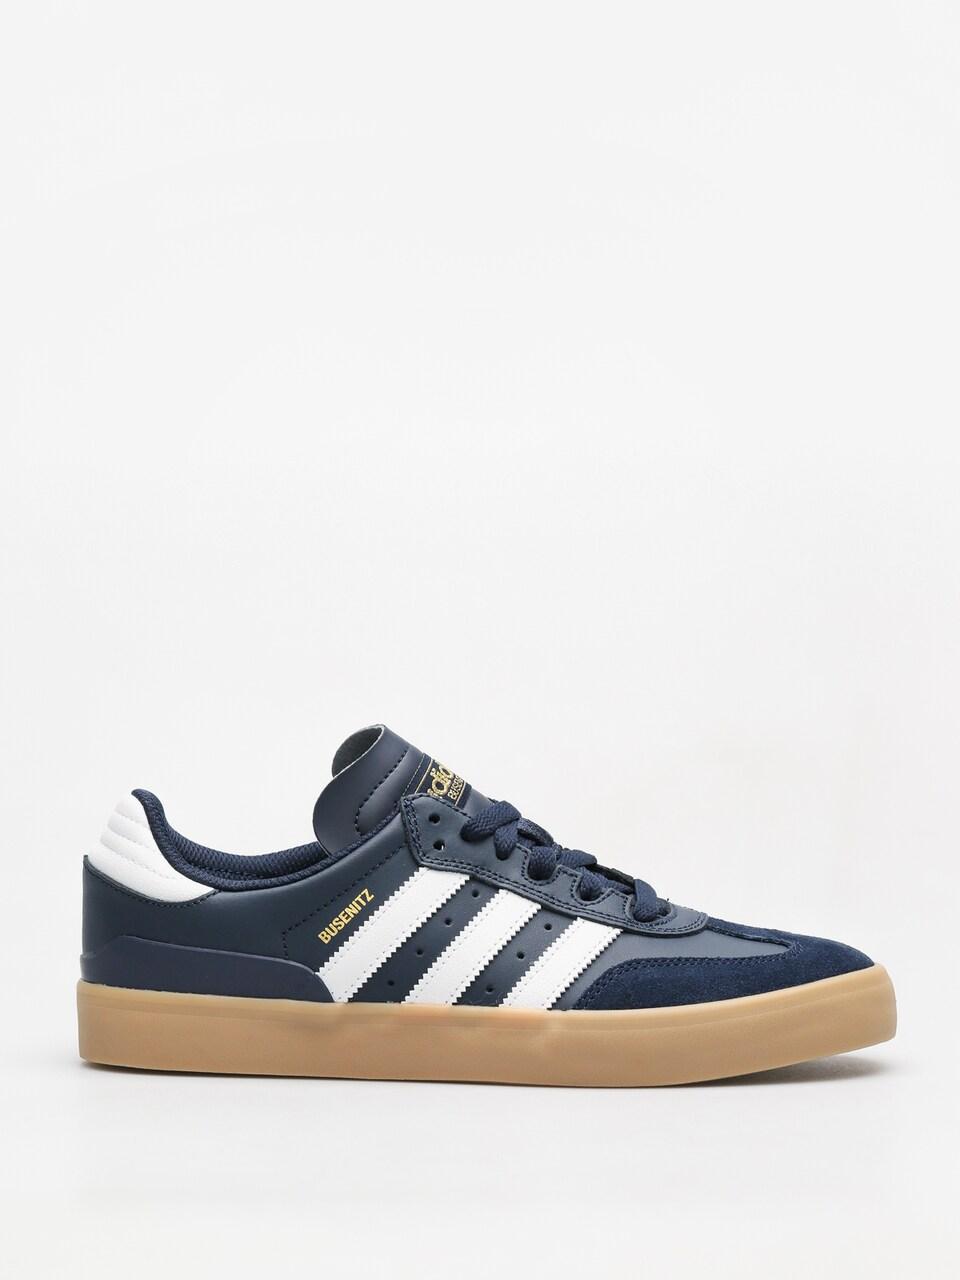 Parlamento sobre pintar  adidas Shoes Busenitz Vulc Rx (collegiate navy/ftwr white/gum4)